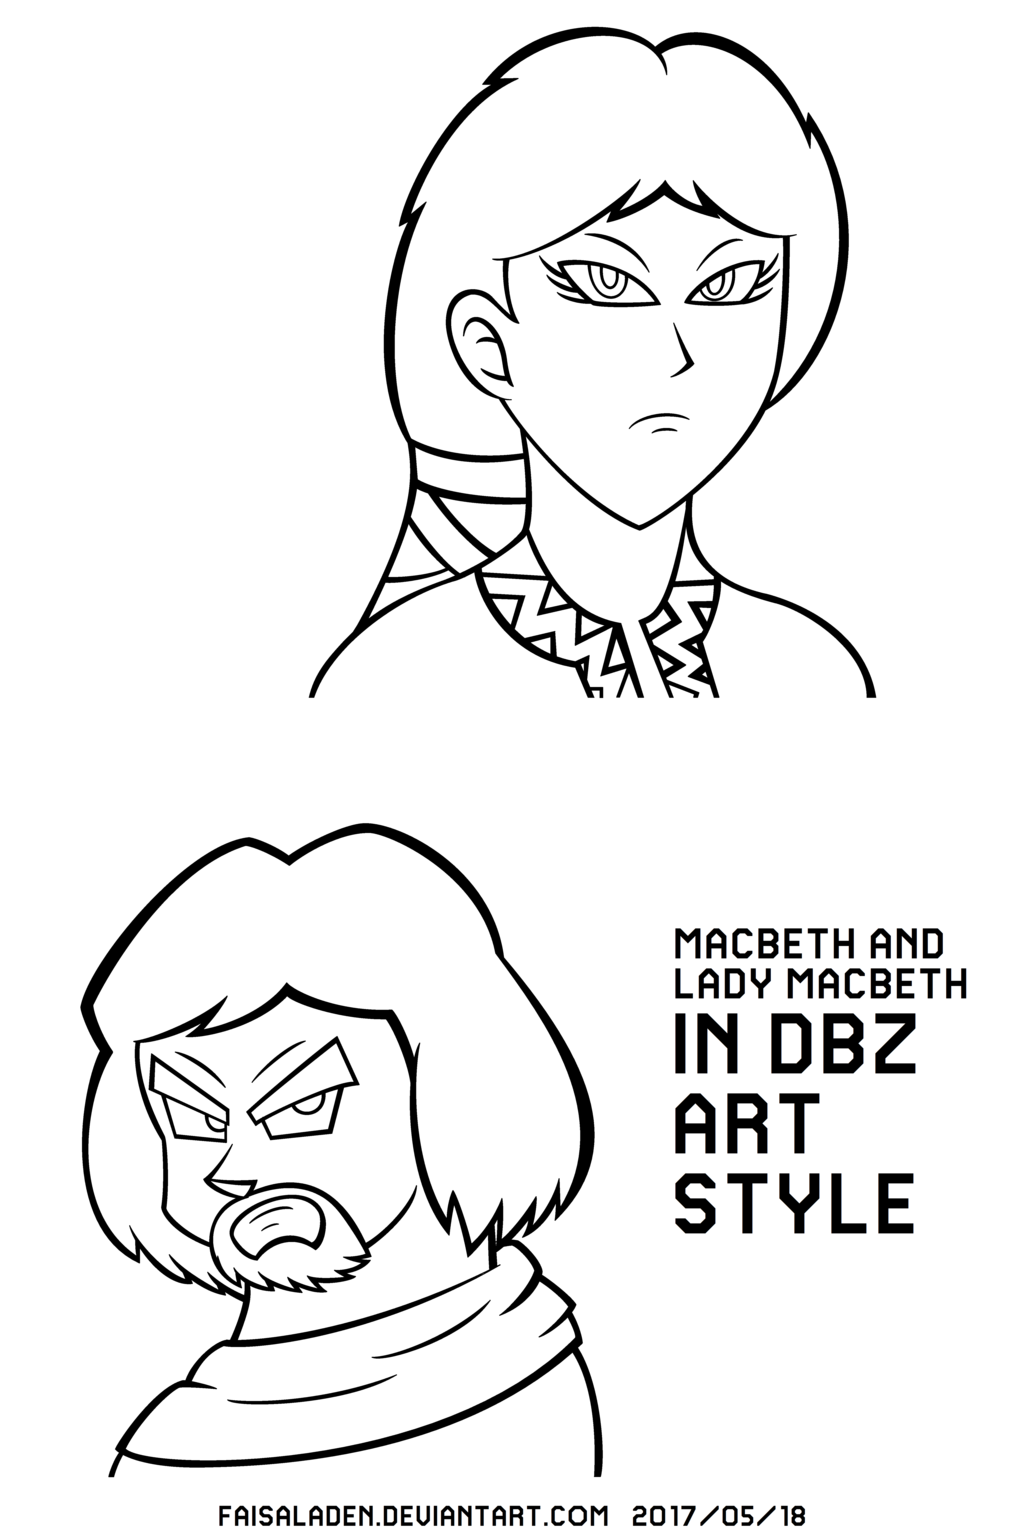 1024x1536 Macbethlady Macbeth In Dbz Art Style (Schoolwork) By Faisaladen